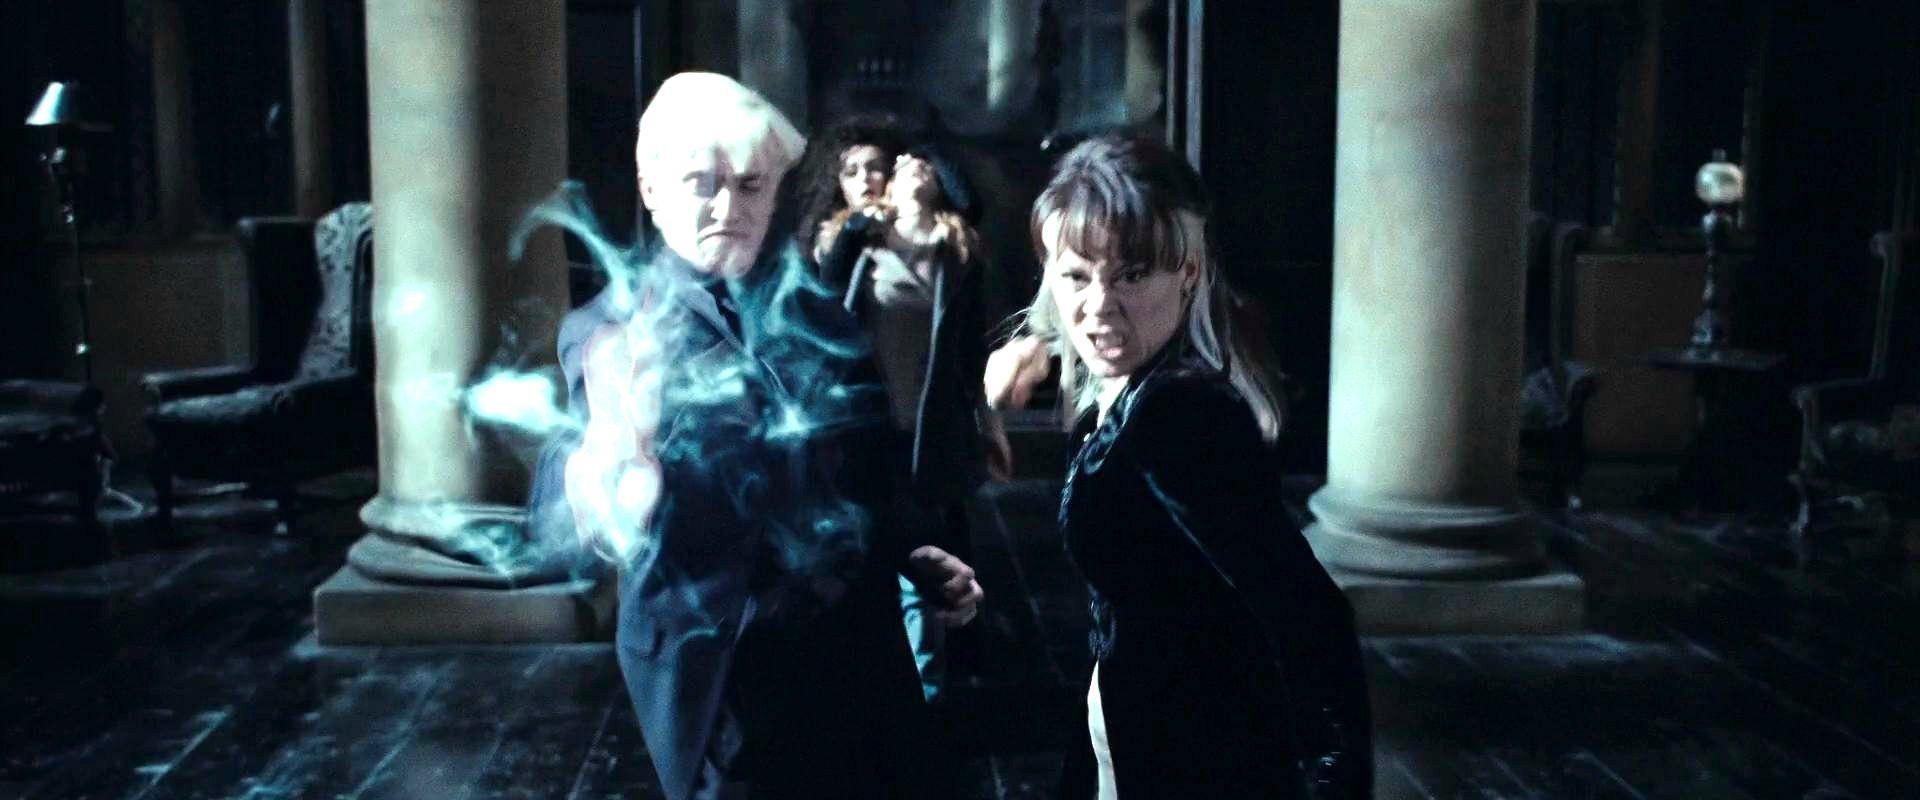 Narcissa y Draco luchando.jpg